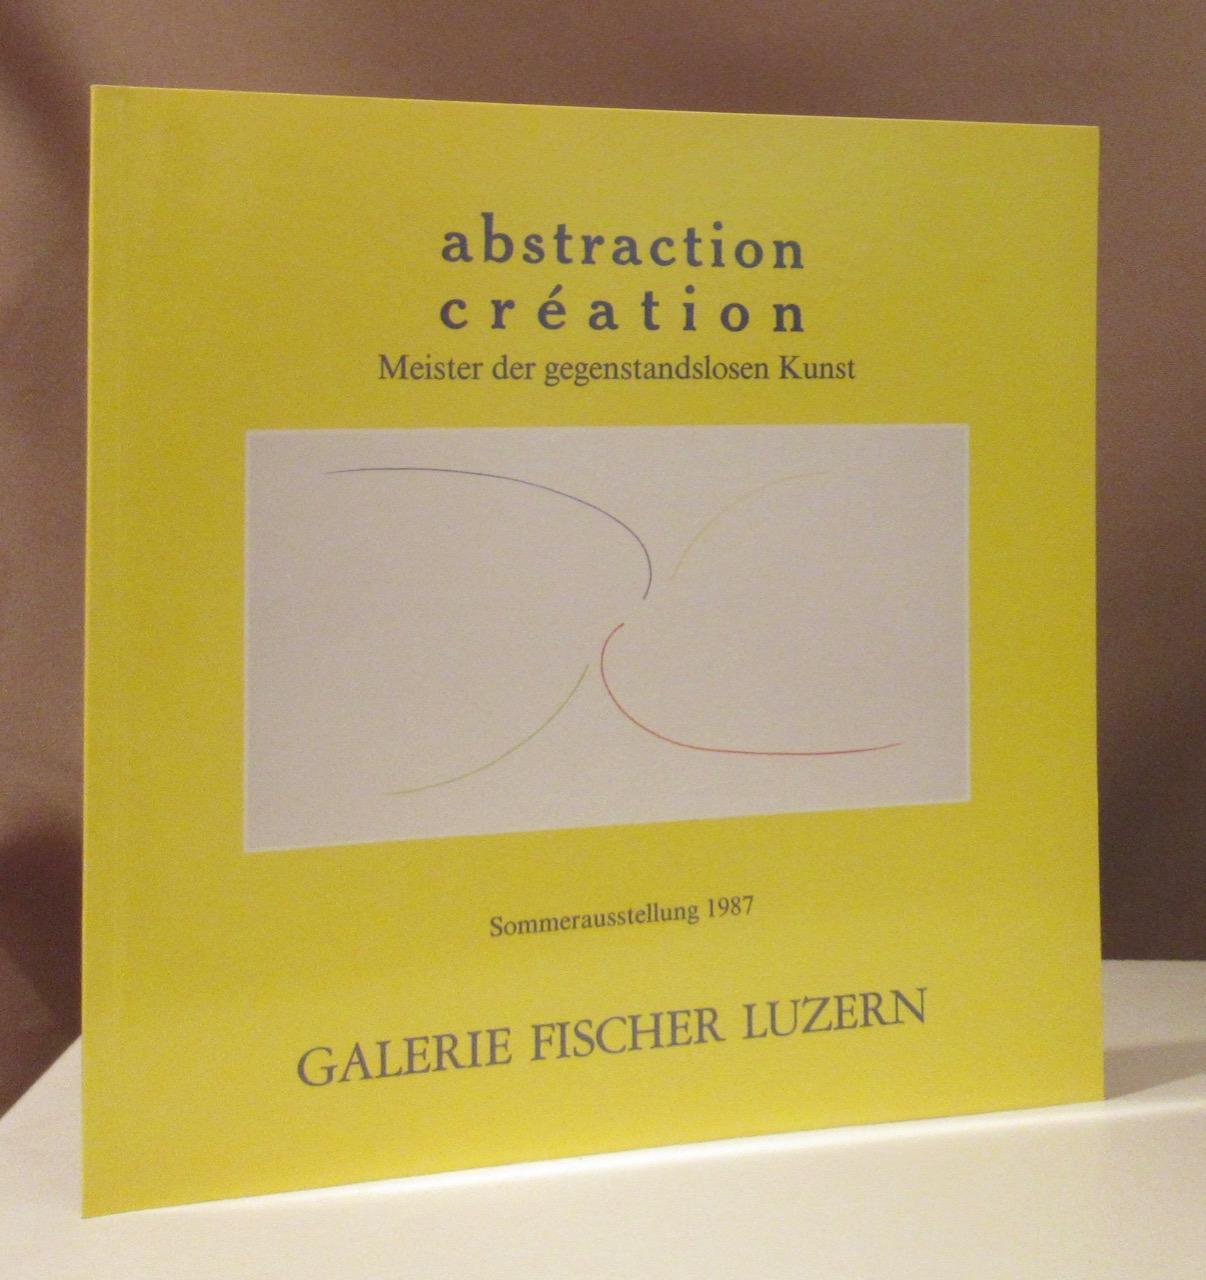 abstraction création. Meister der gegenstandslosen Kunst. Sommerausstellung